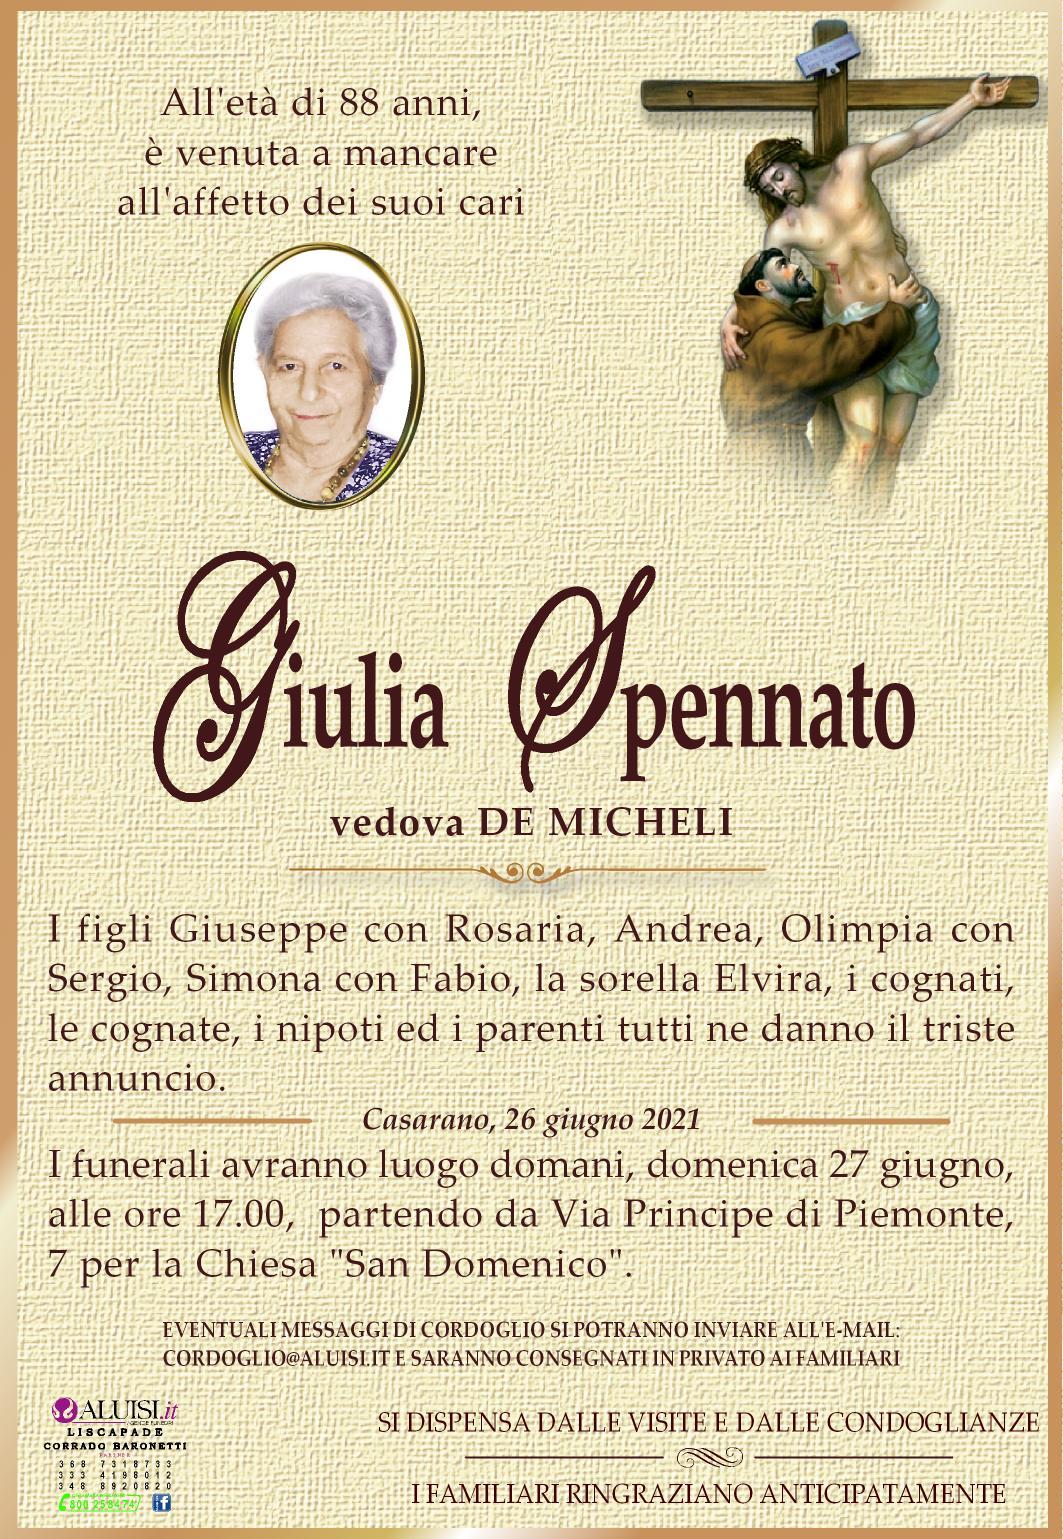 Annuncio-GIULIA-SPENNATO-CASRANO-1.jpg